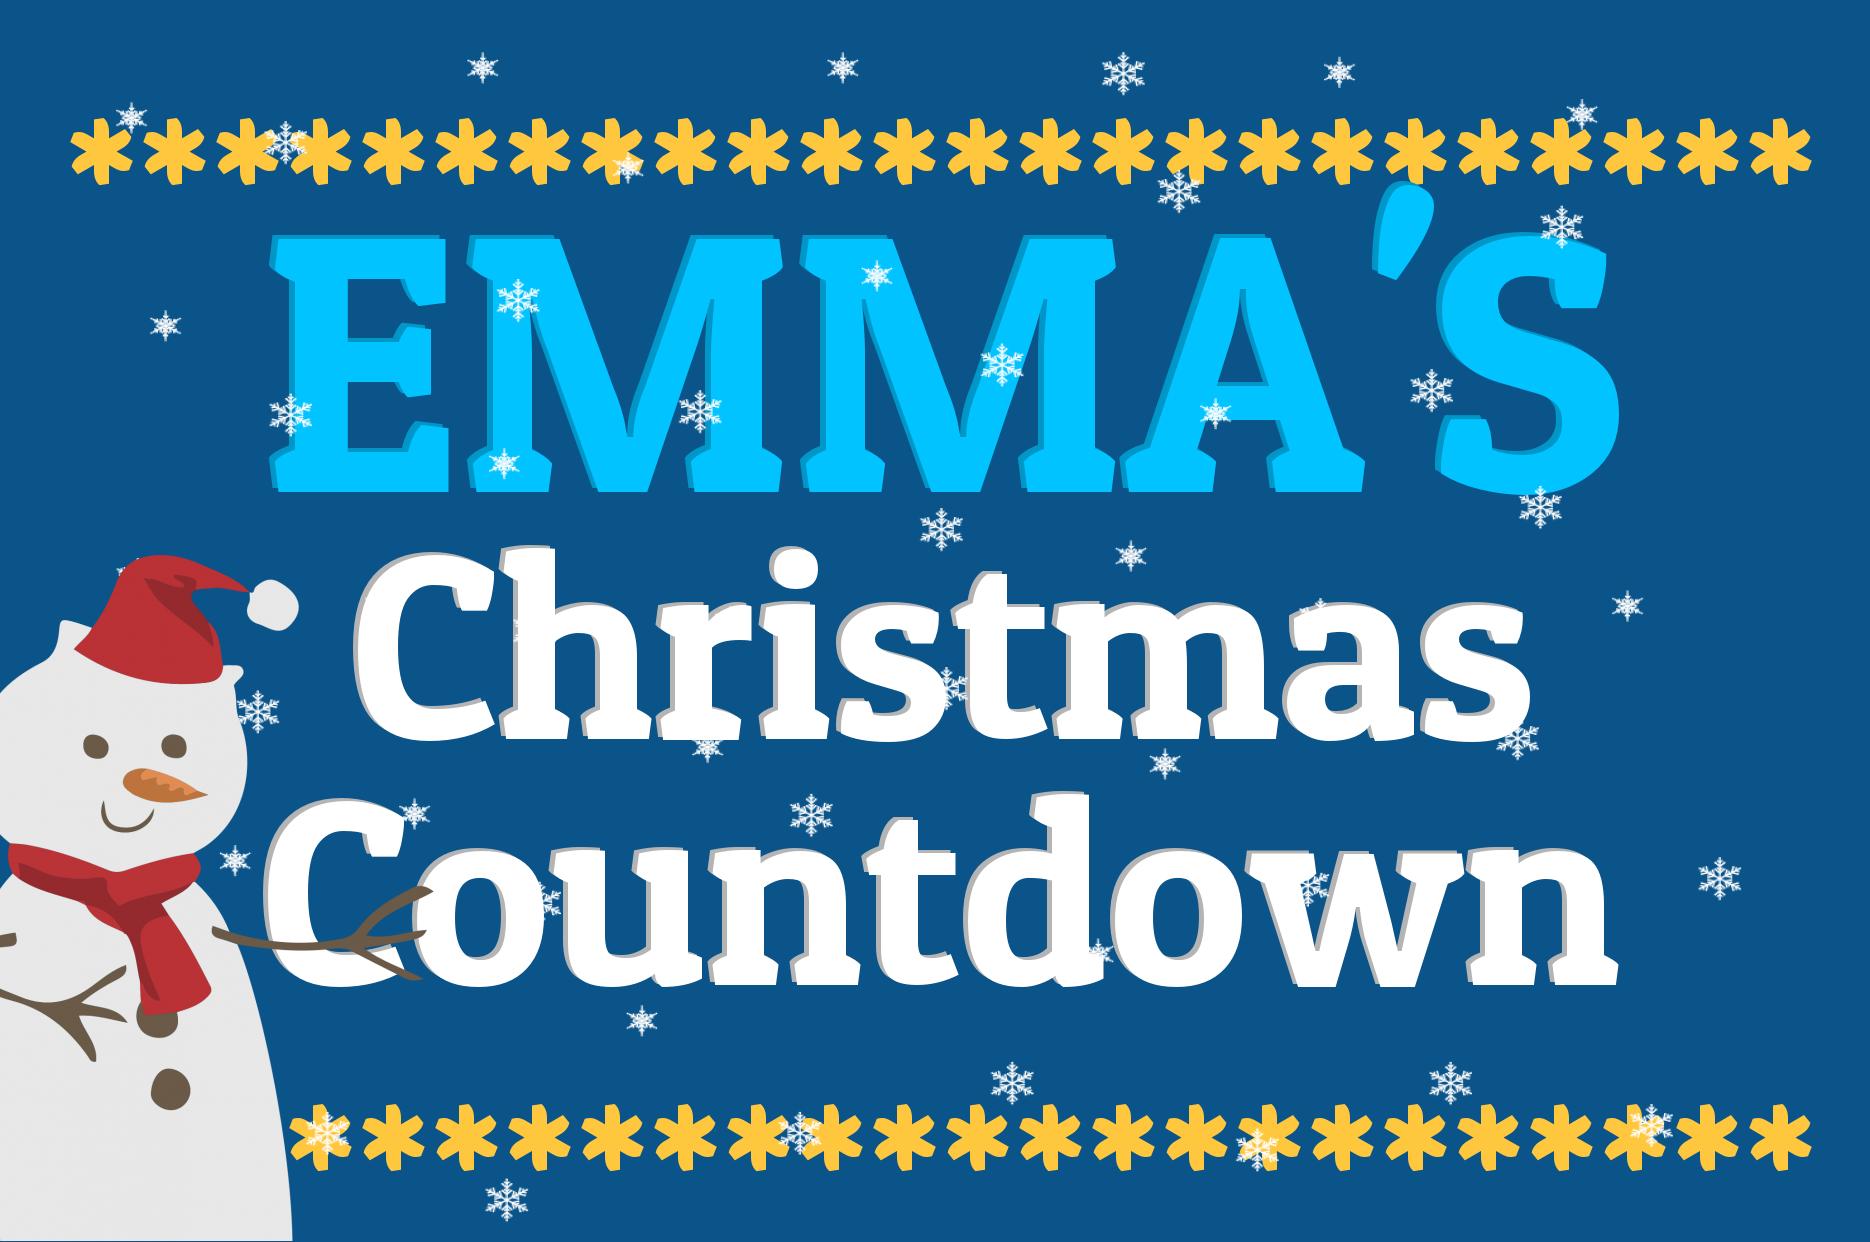 Christmas Countdown 2017 Christmas Countdown Christmas Countdown 2017 Days Until Christmas